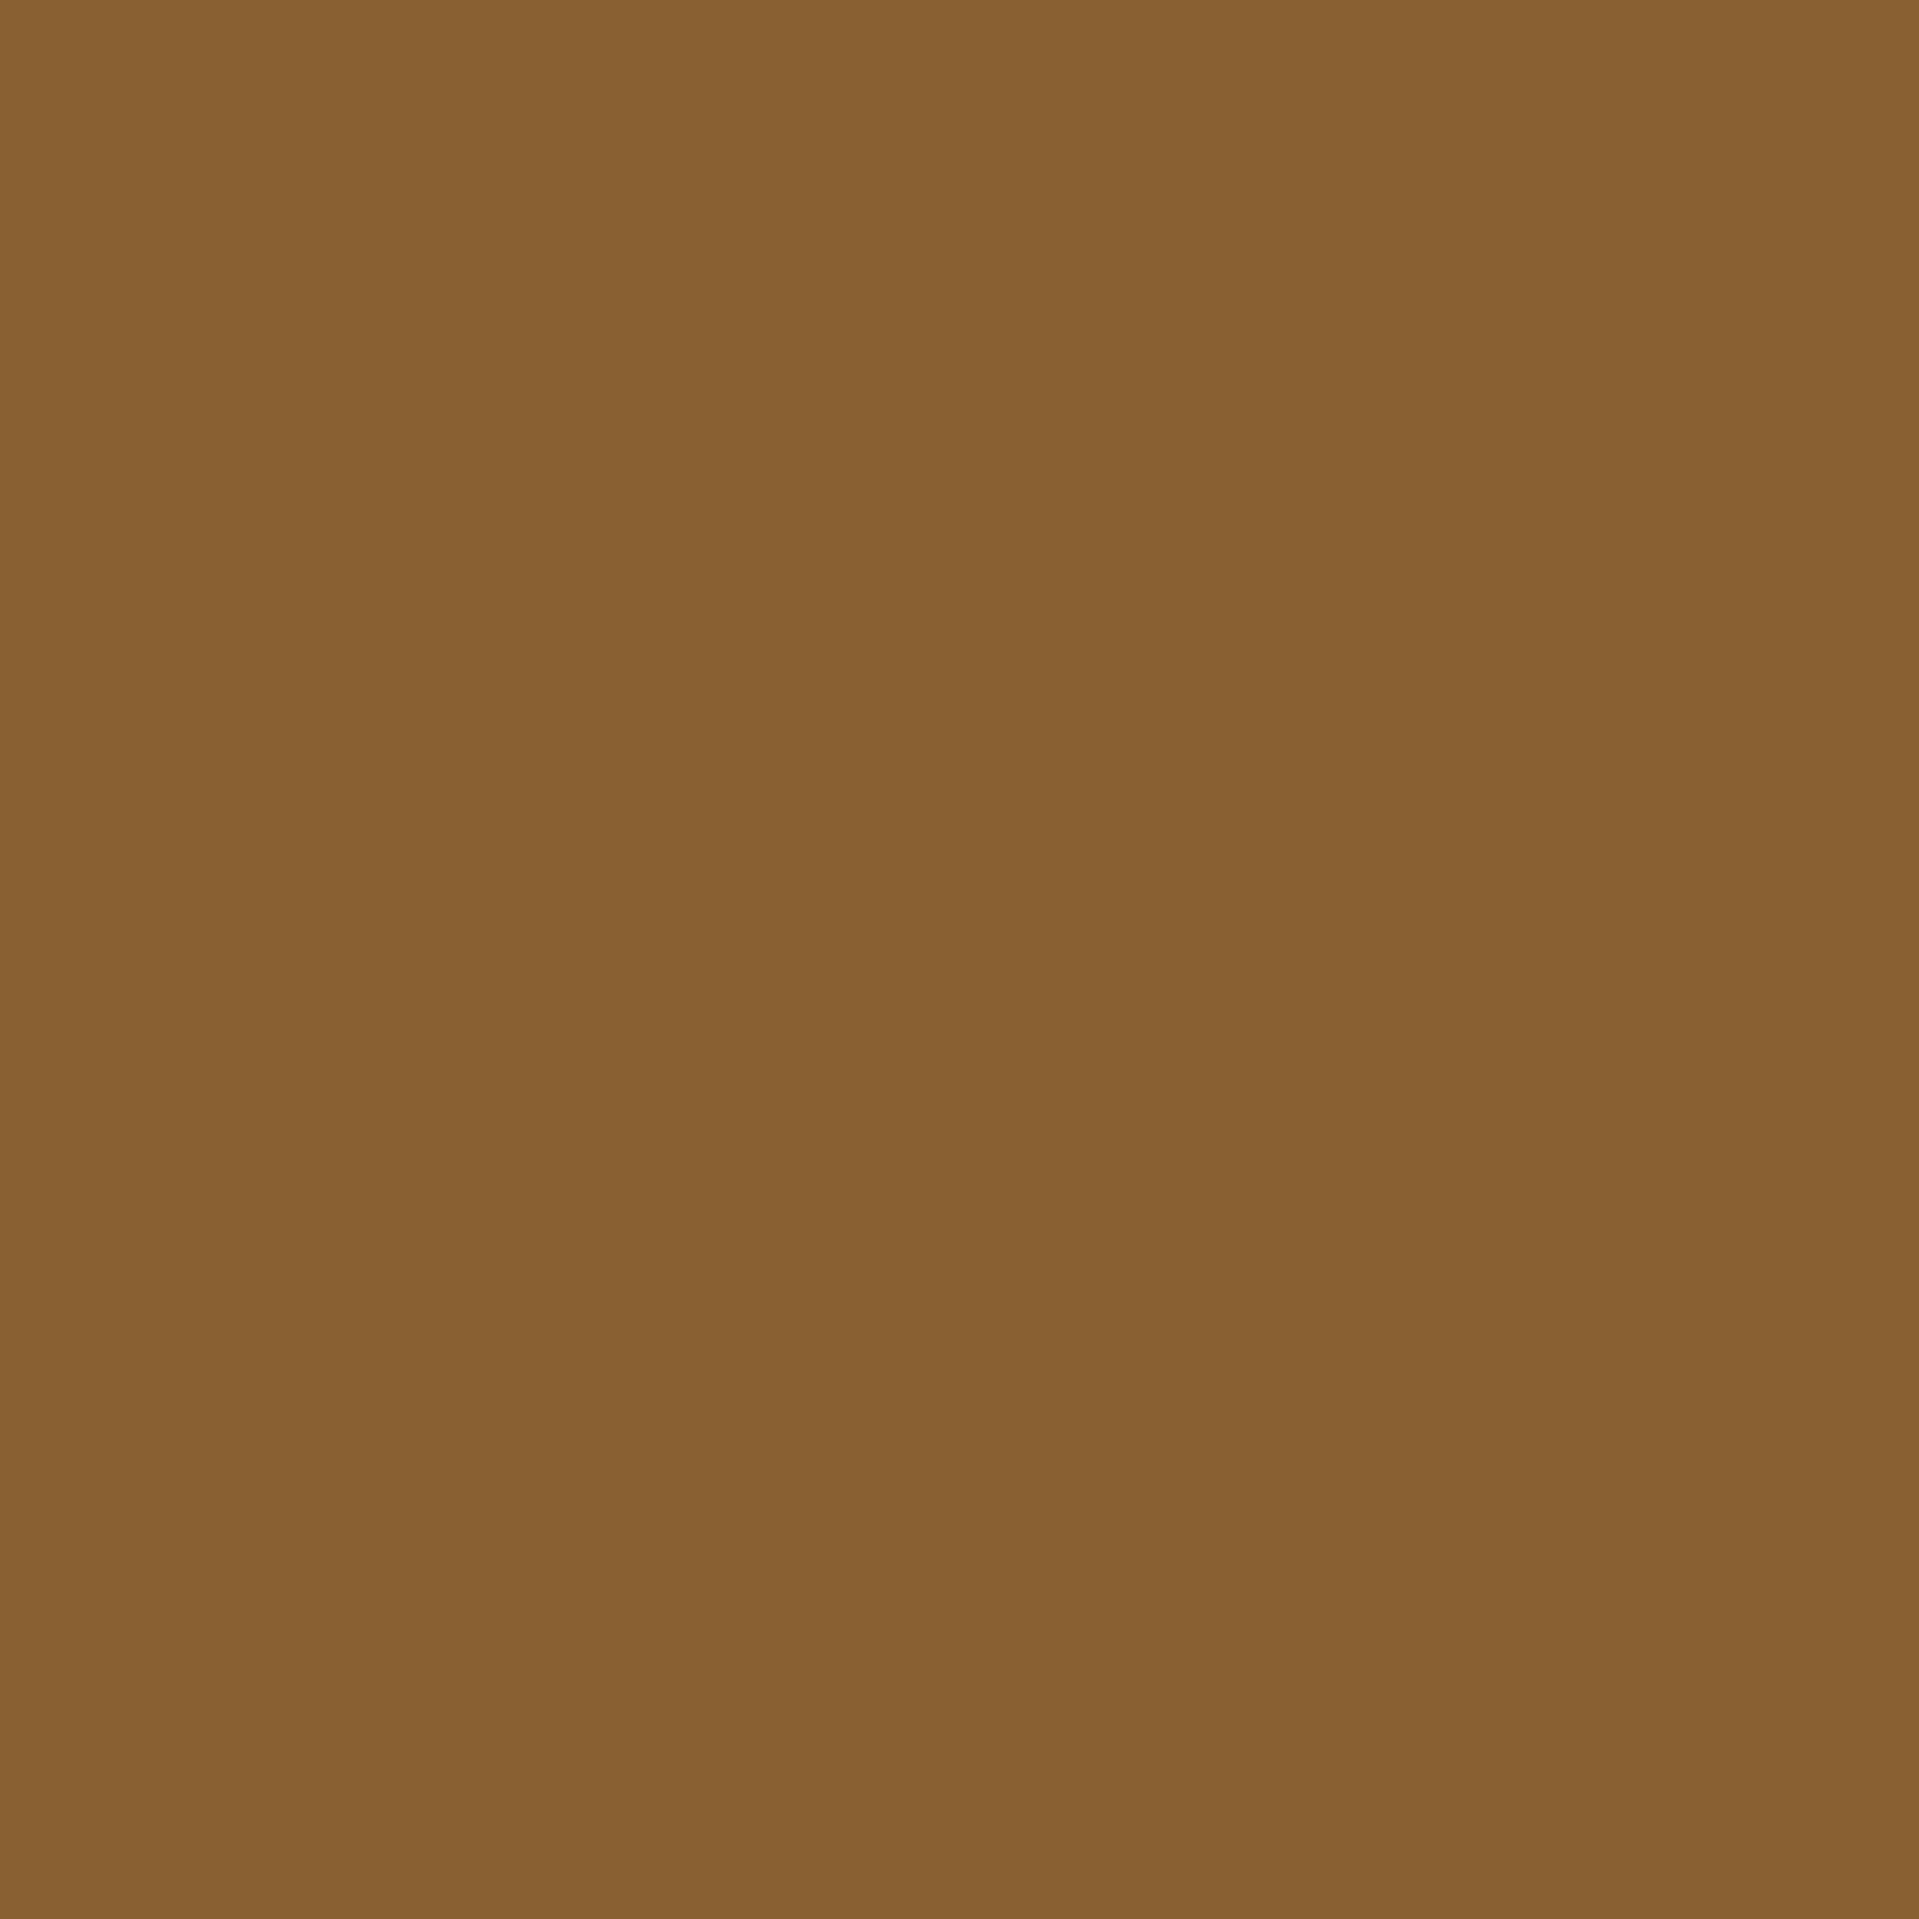 Frühlingszwiebeln (Allium cepa L.)